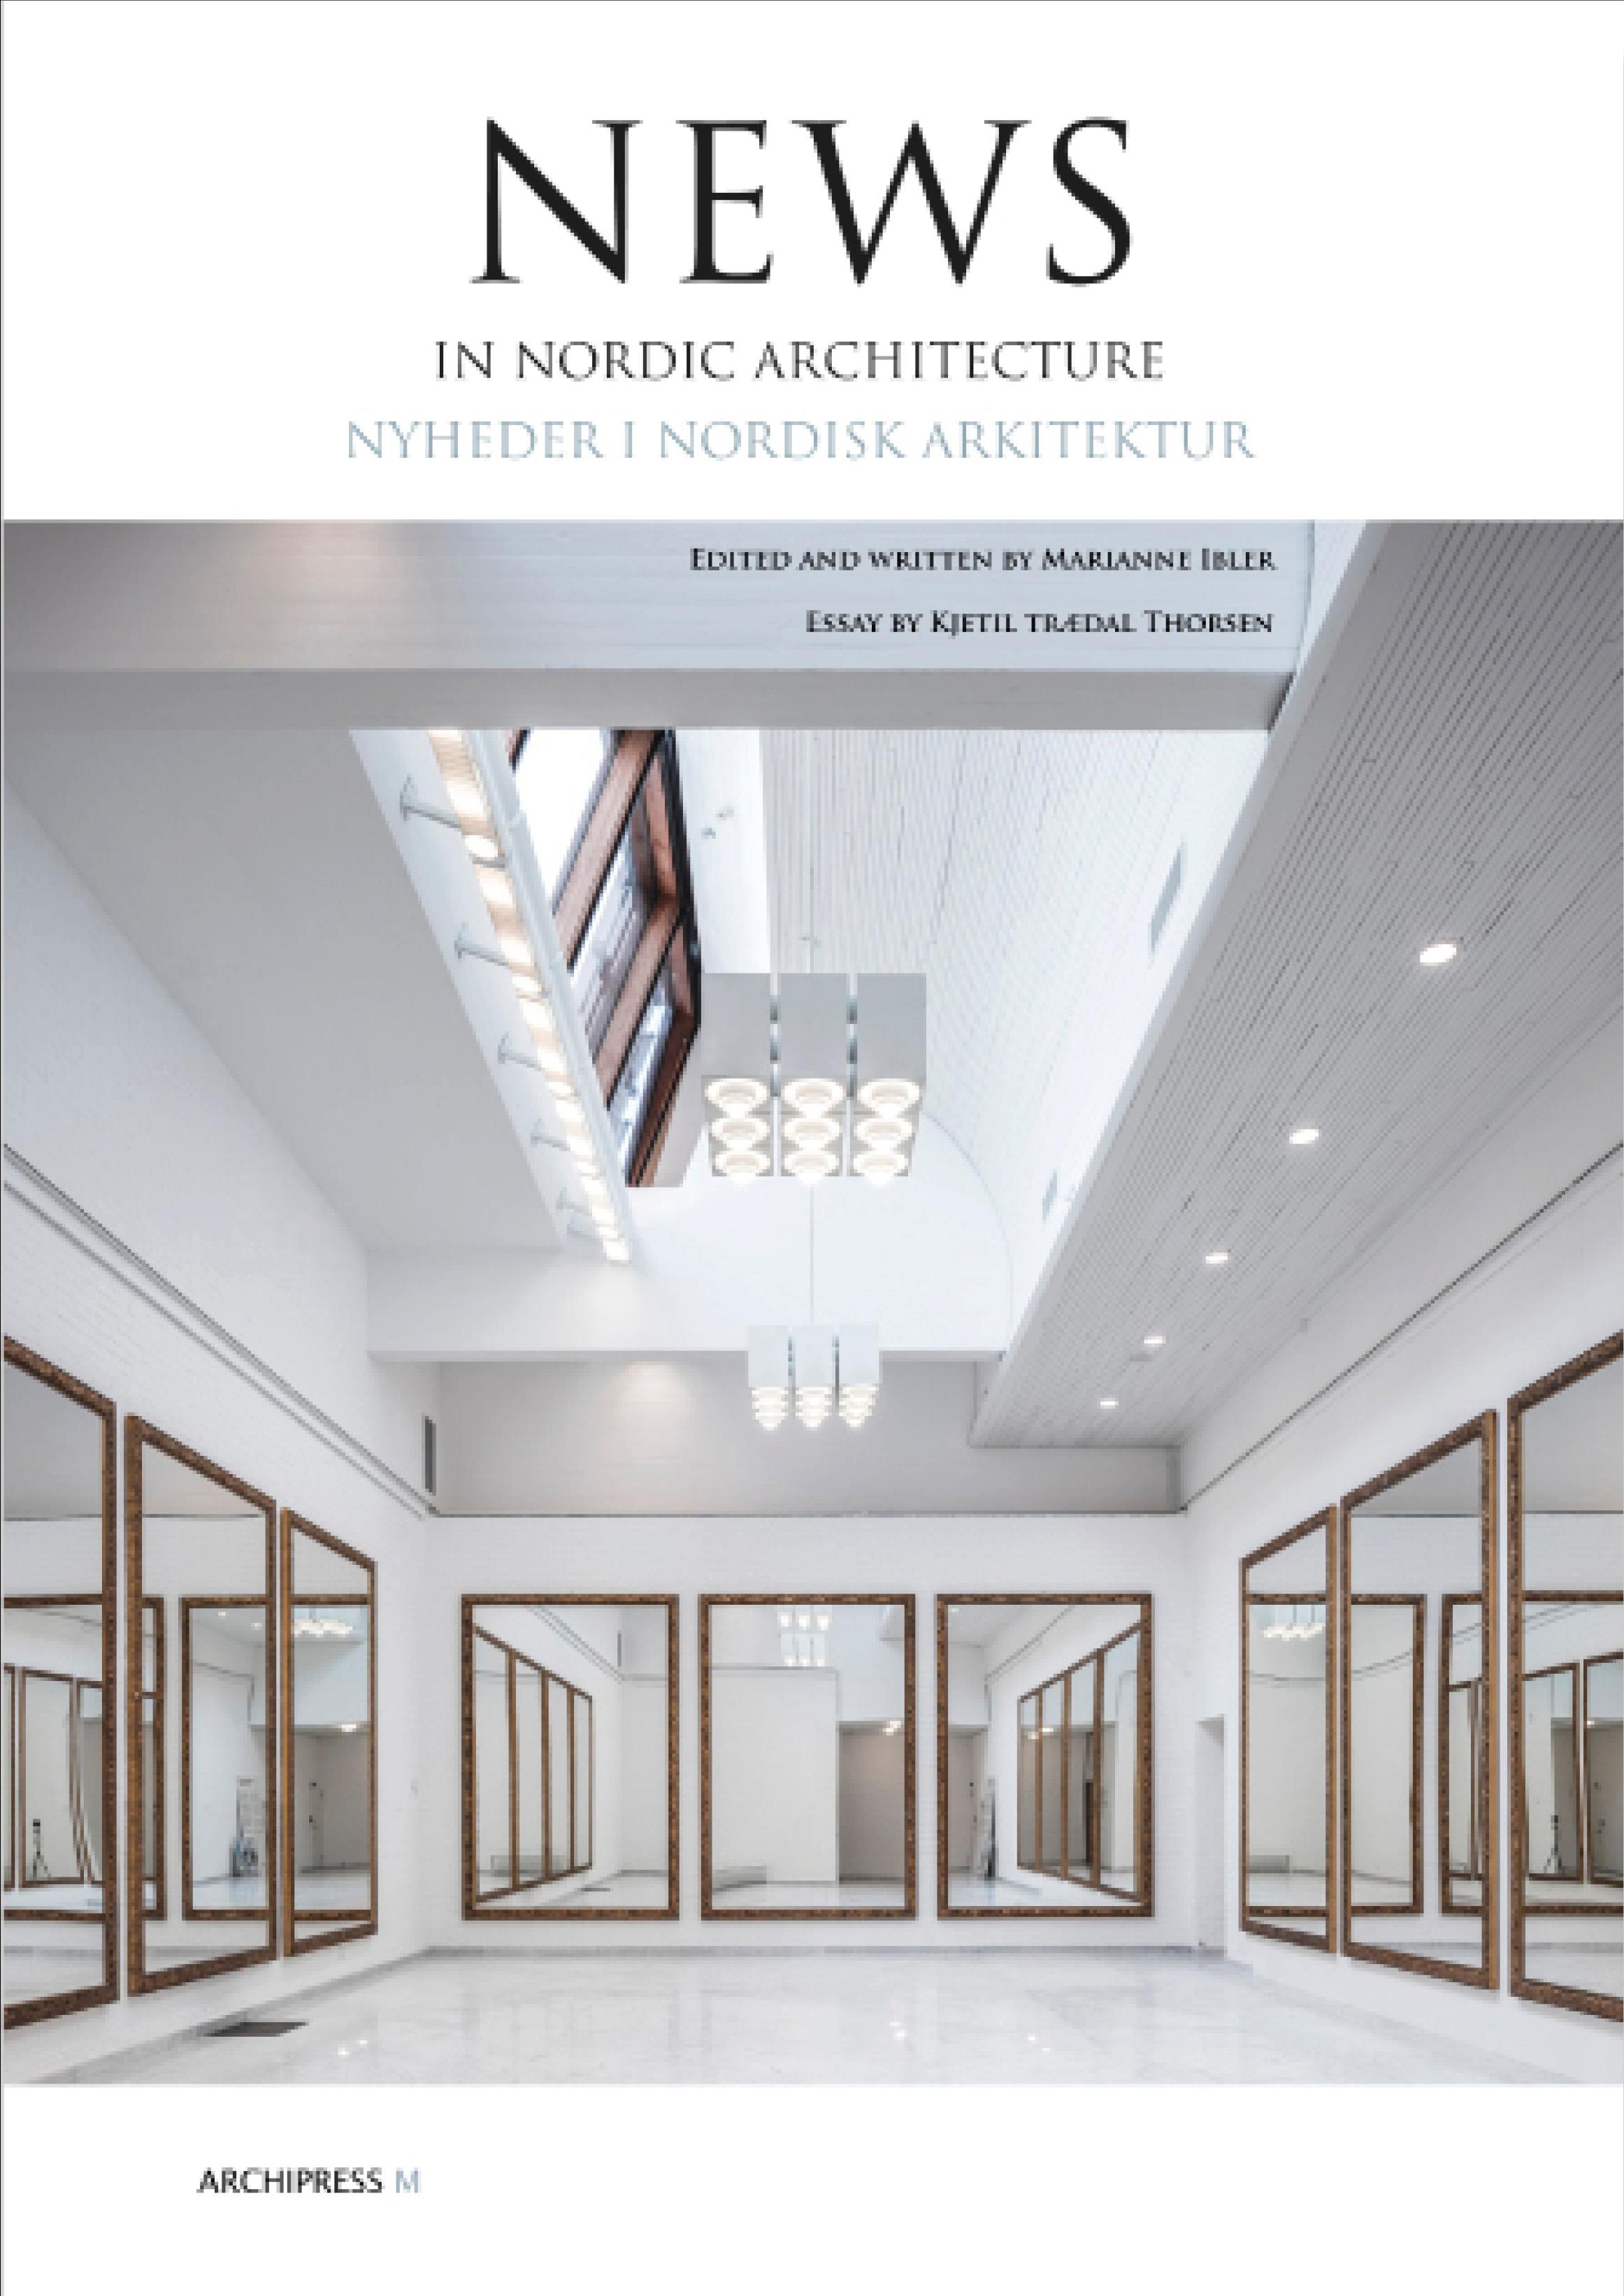 News in Nordic Architecture - Marianne Ibler - Bøger - Archipress M - 9788791872181 - October 6, 2017